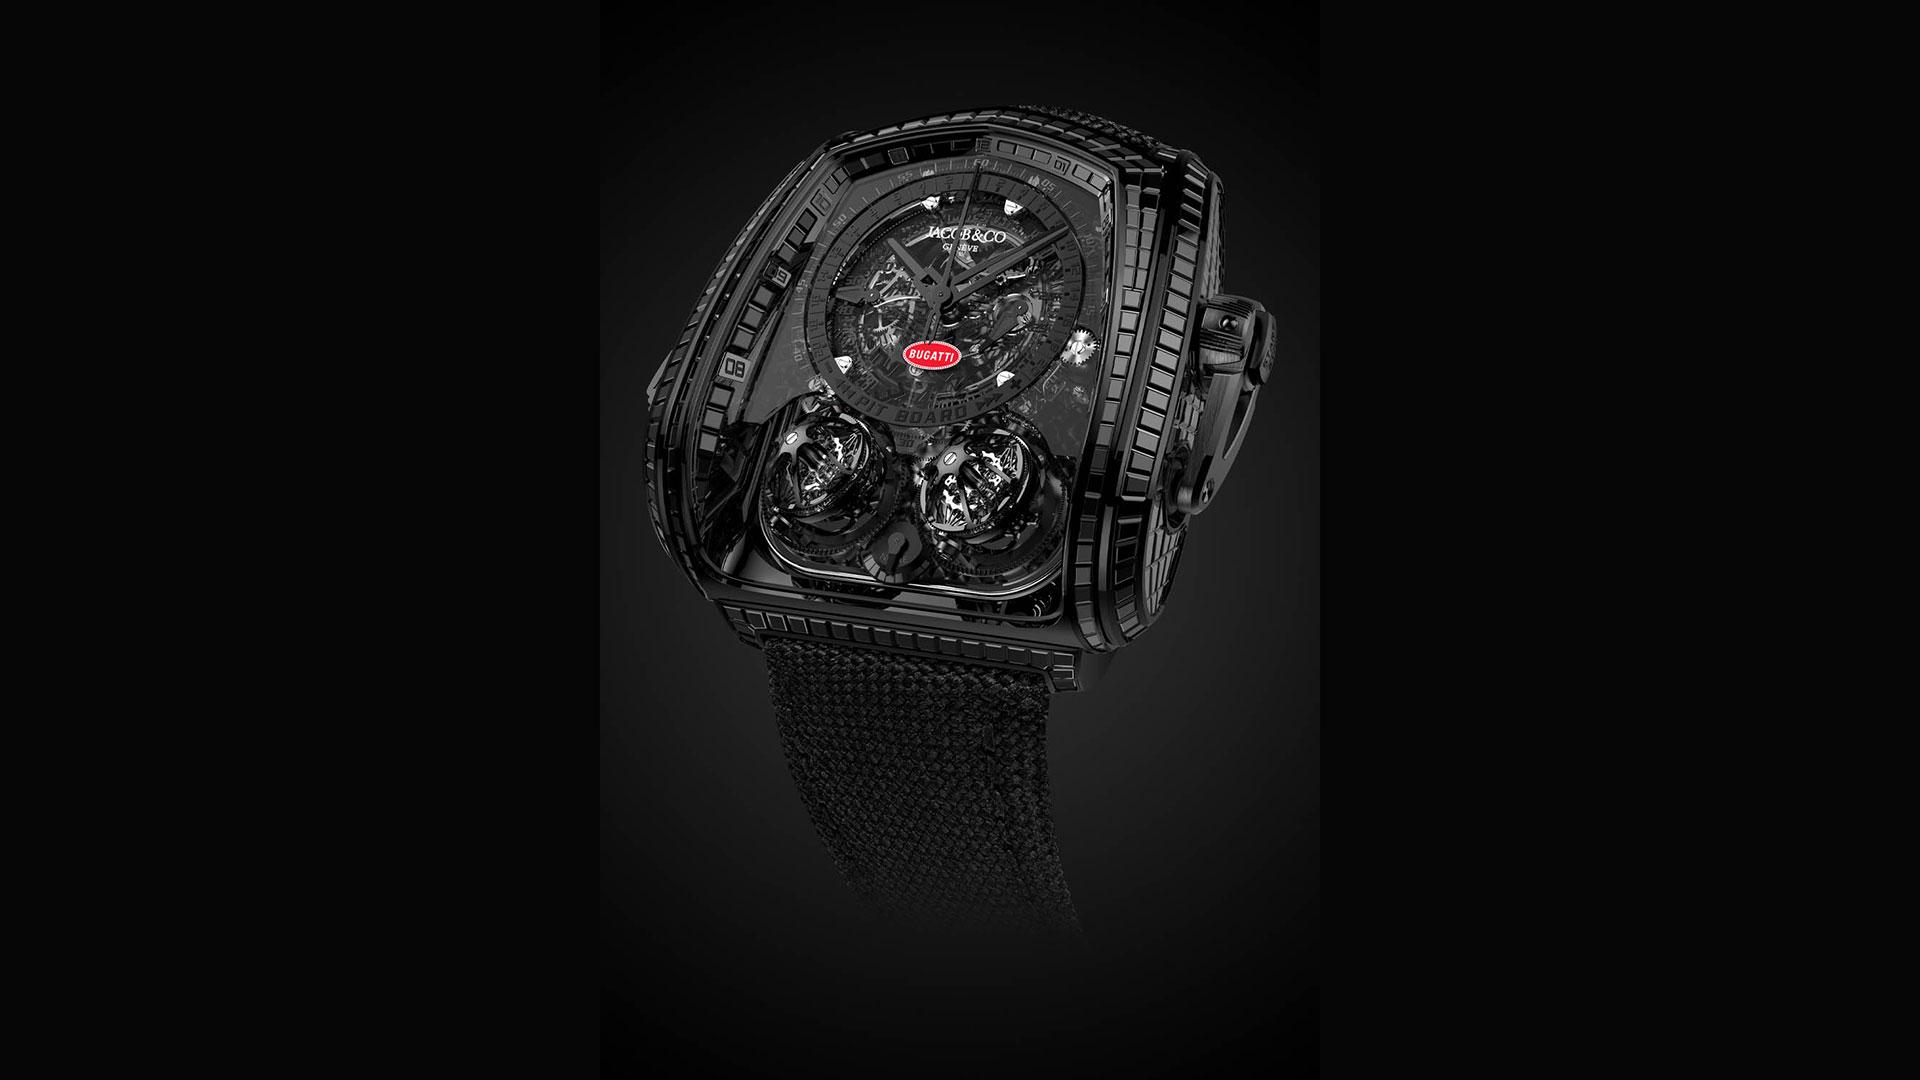 jacob-&-co-bugatti-la-montre-noire-twin-turbo-furious